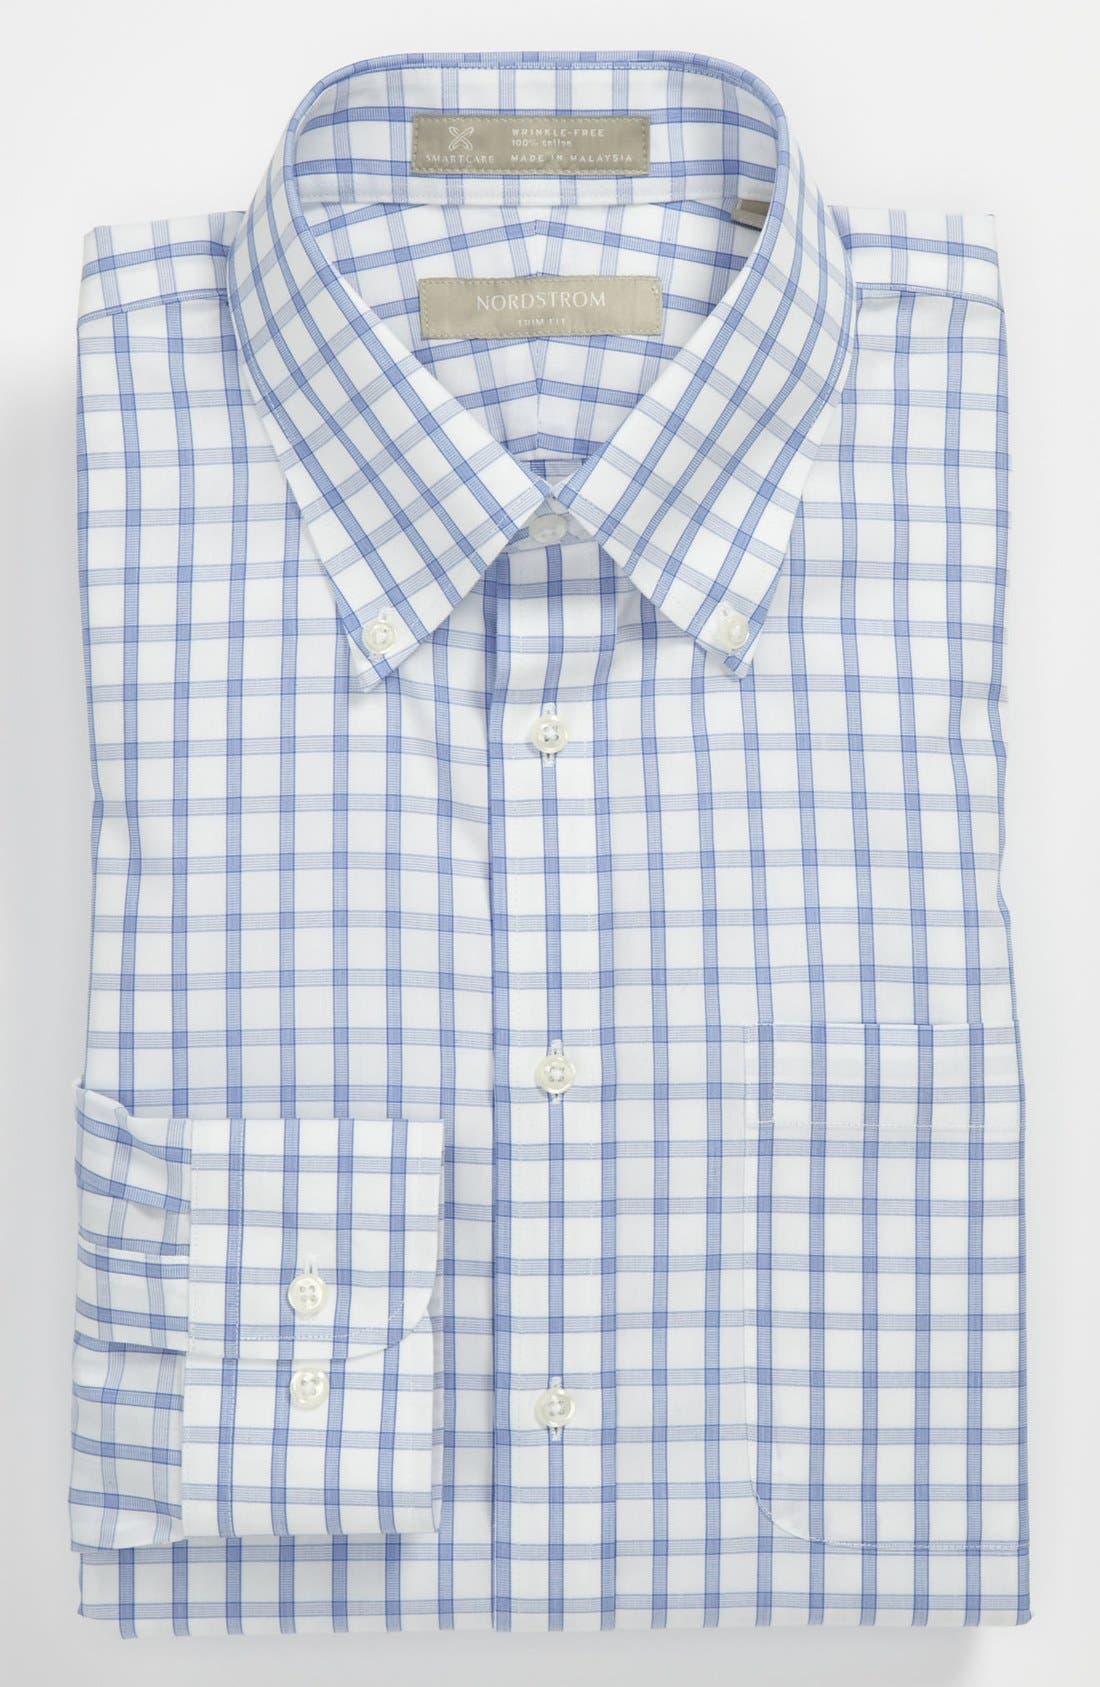 Main Image - Nordstrom Smartcare™ Wrinkle Free Trim Fit Check Dress Shirt